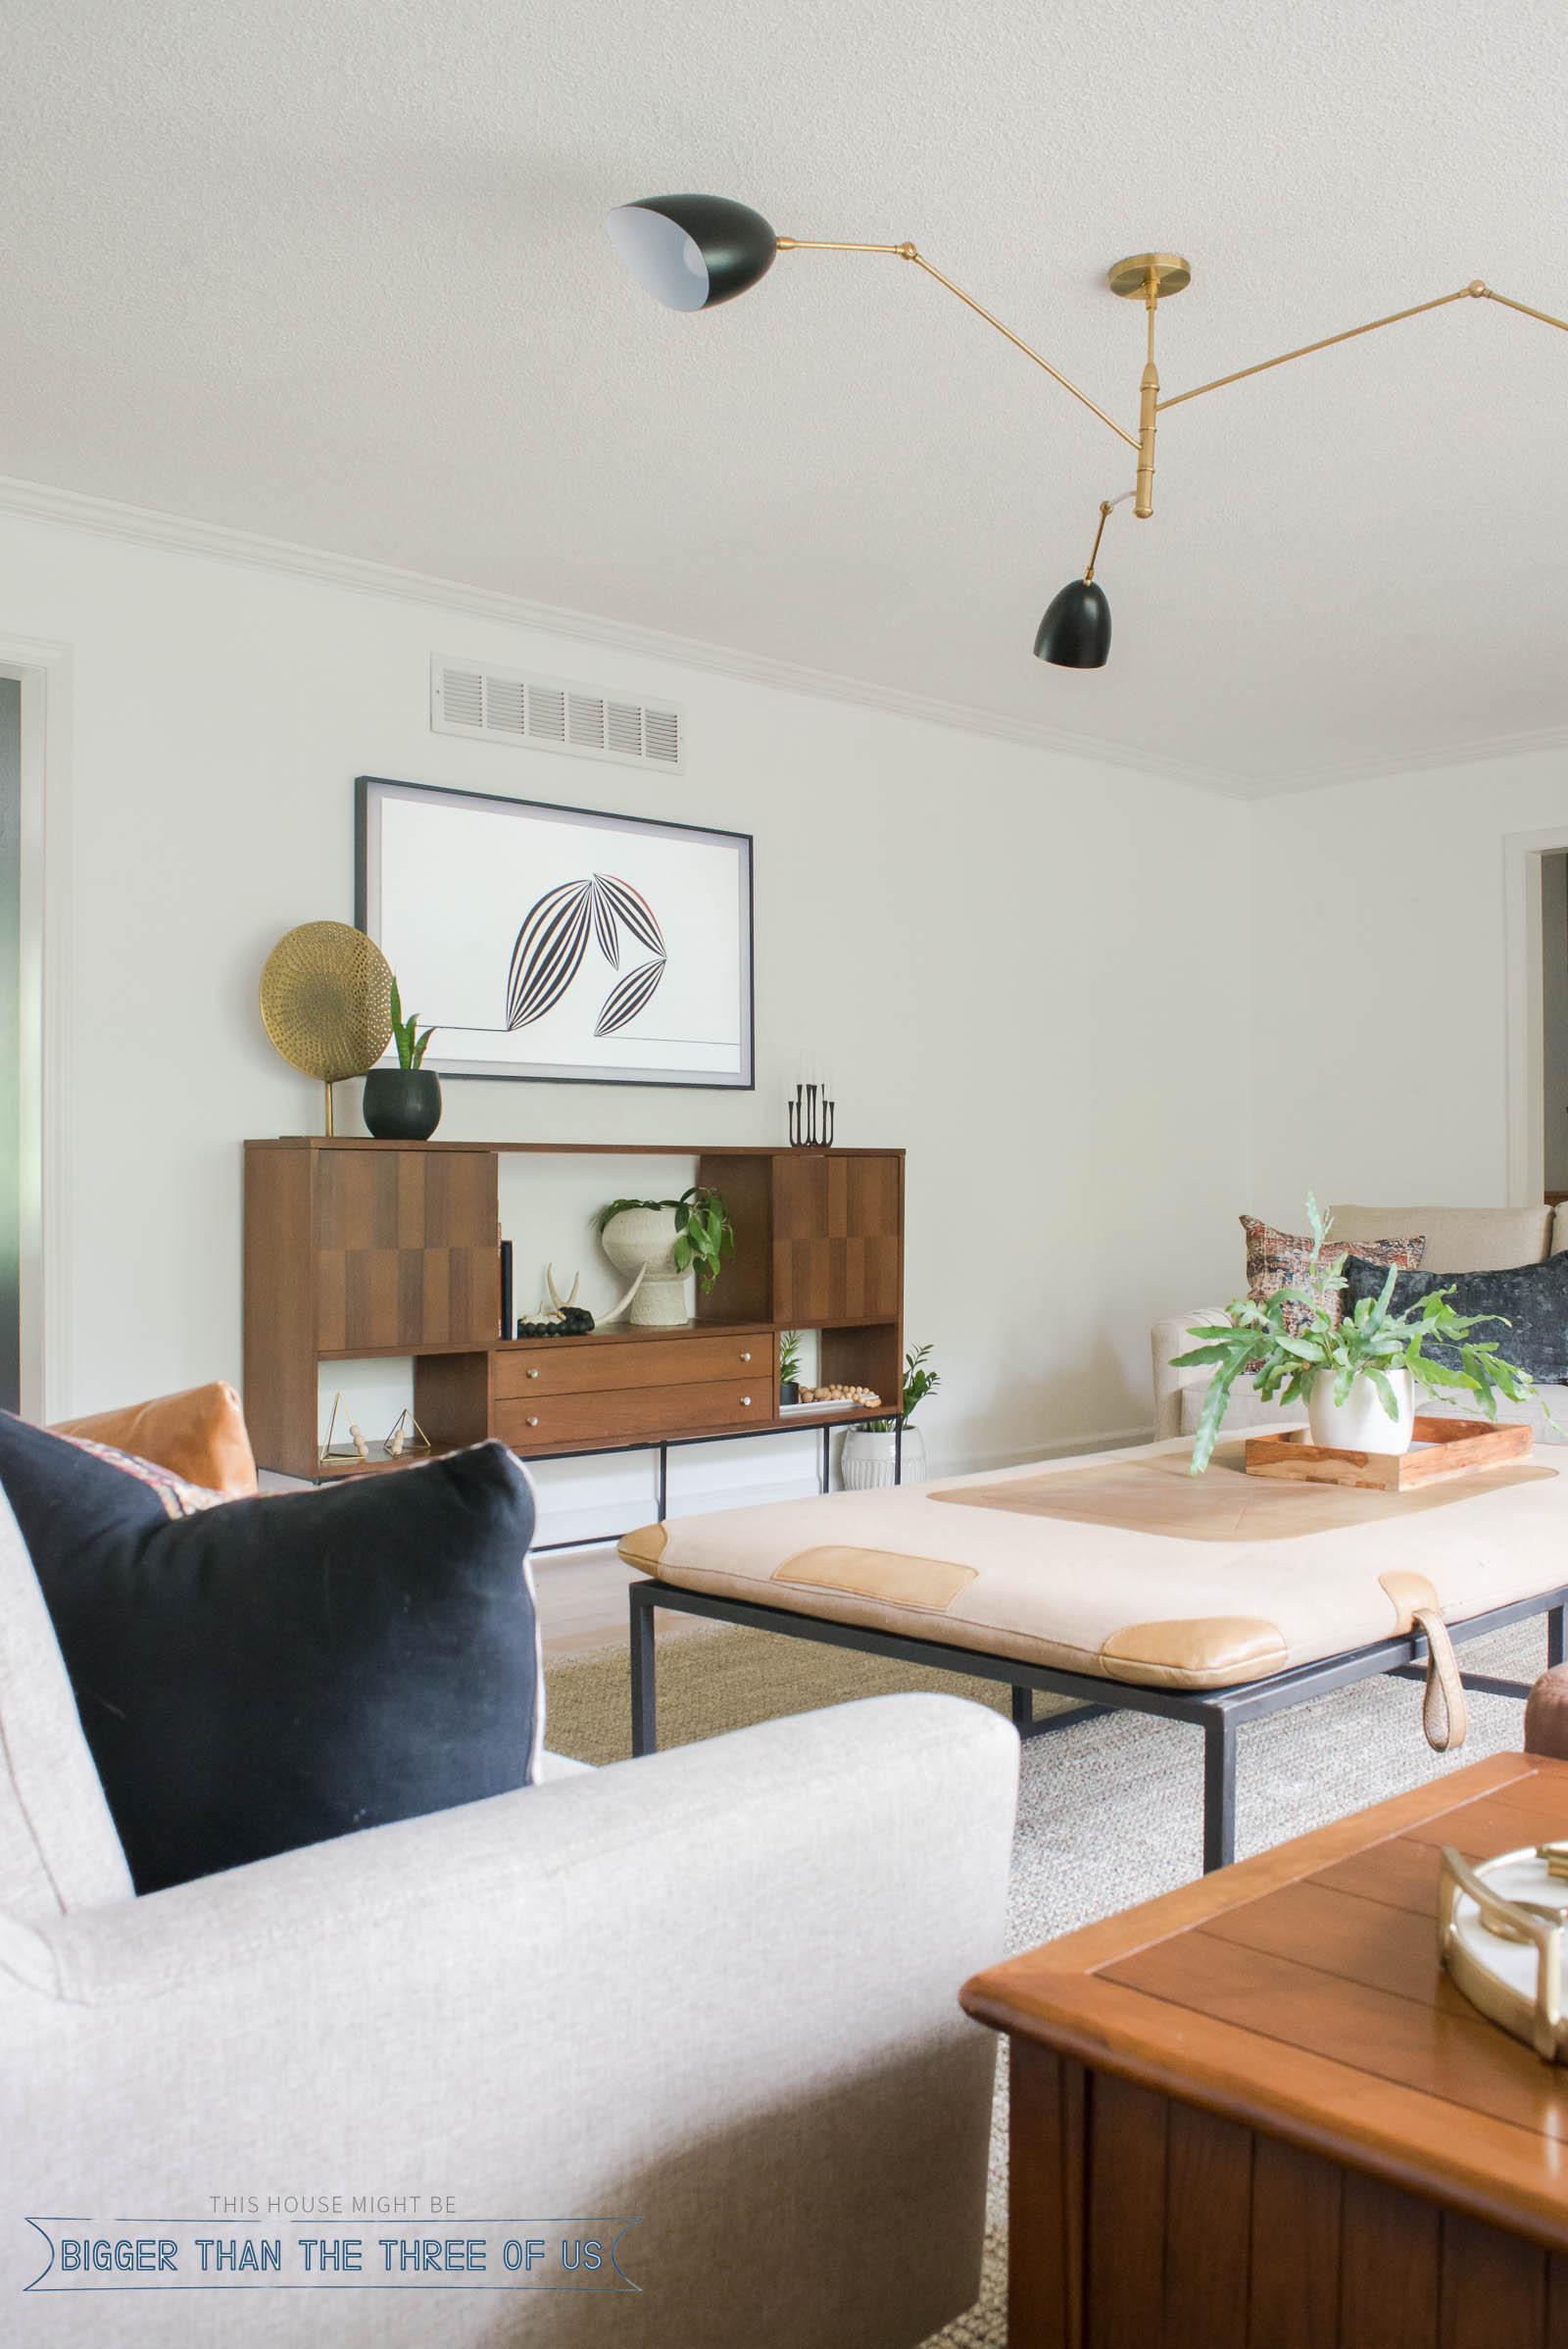 Vintage Modern Living Room - Bigger Than the Three of Us